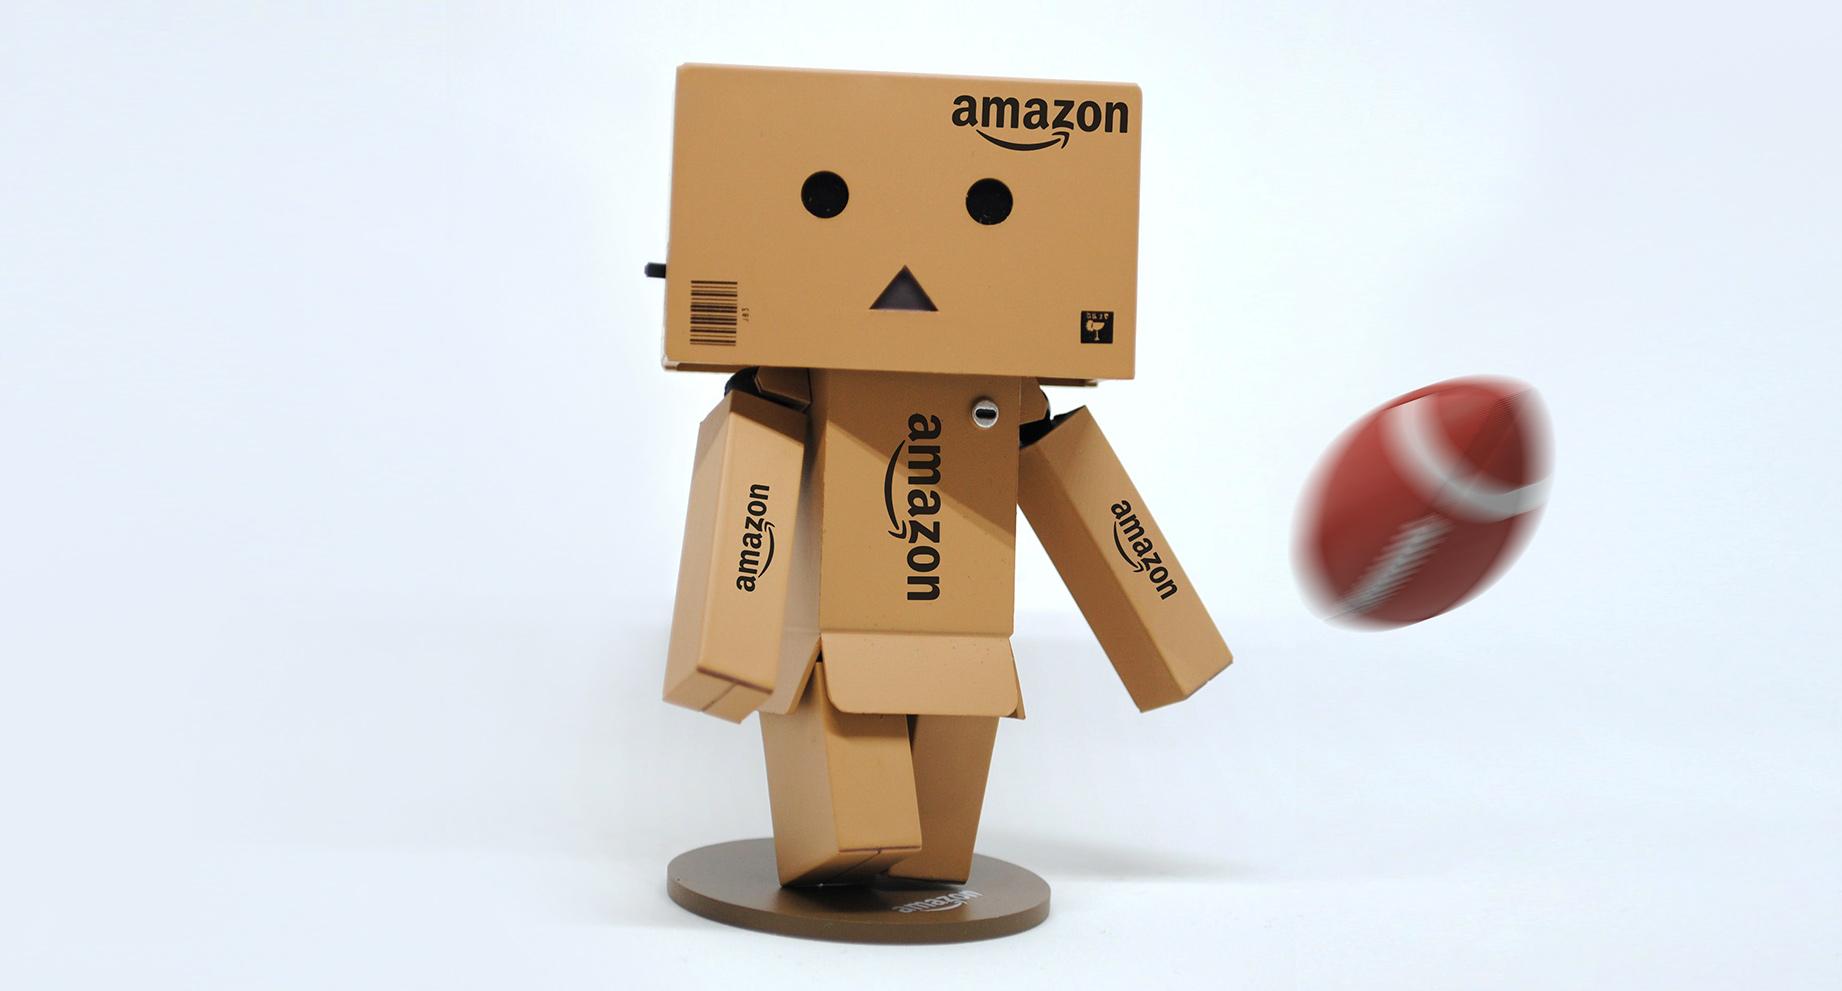 Amazon box character kicks NRL football